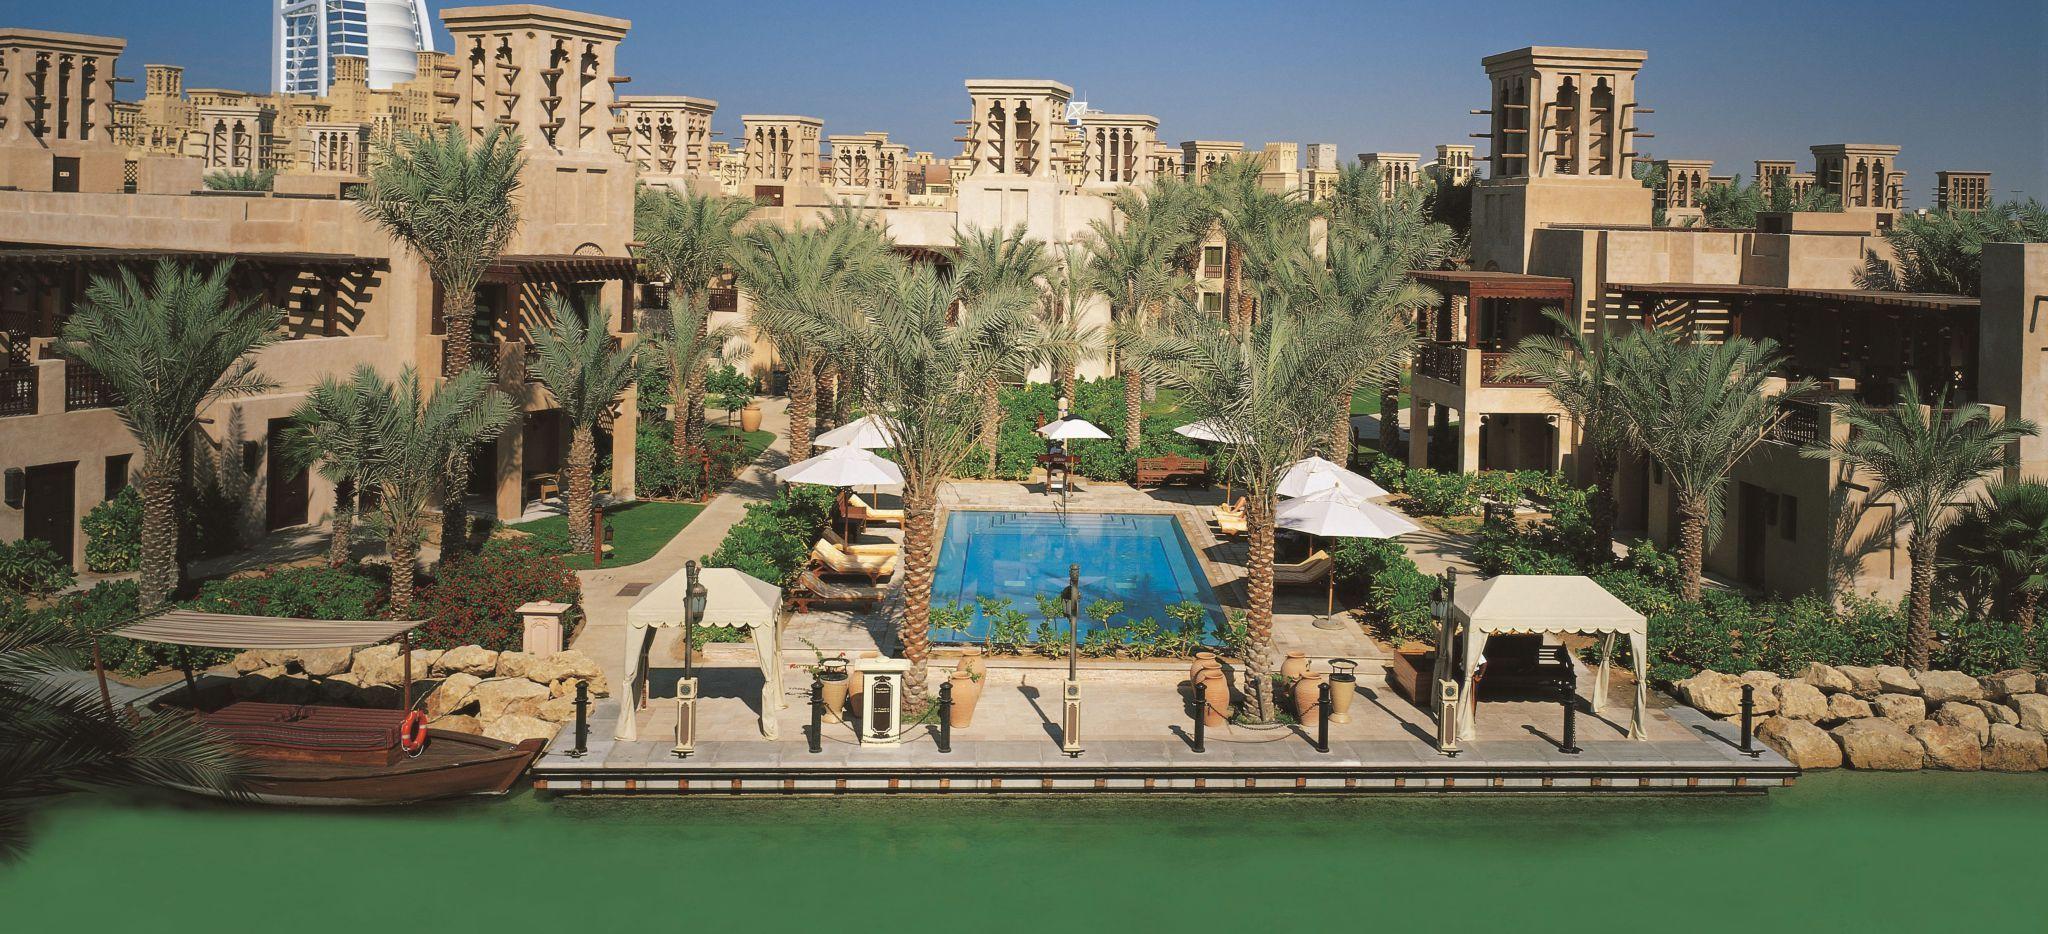 Hotel Madinat Jumeirah Dar Al Masyaf Skyline